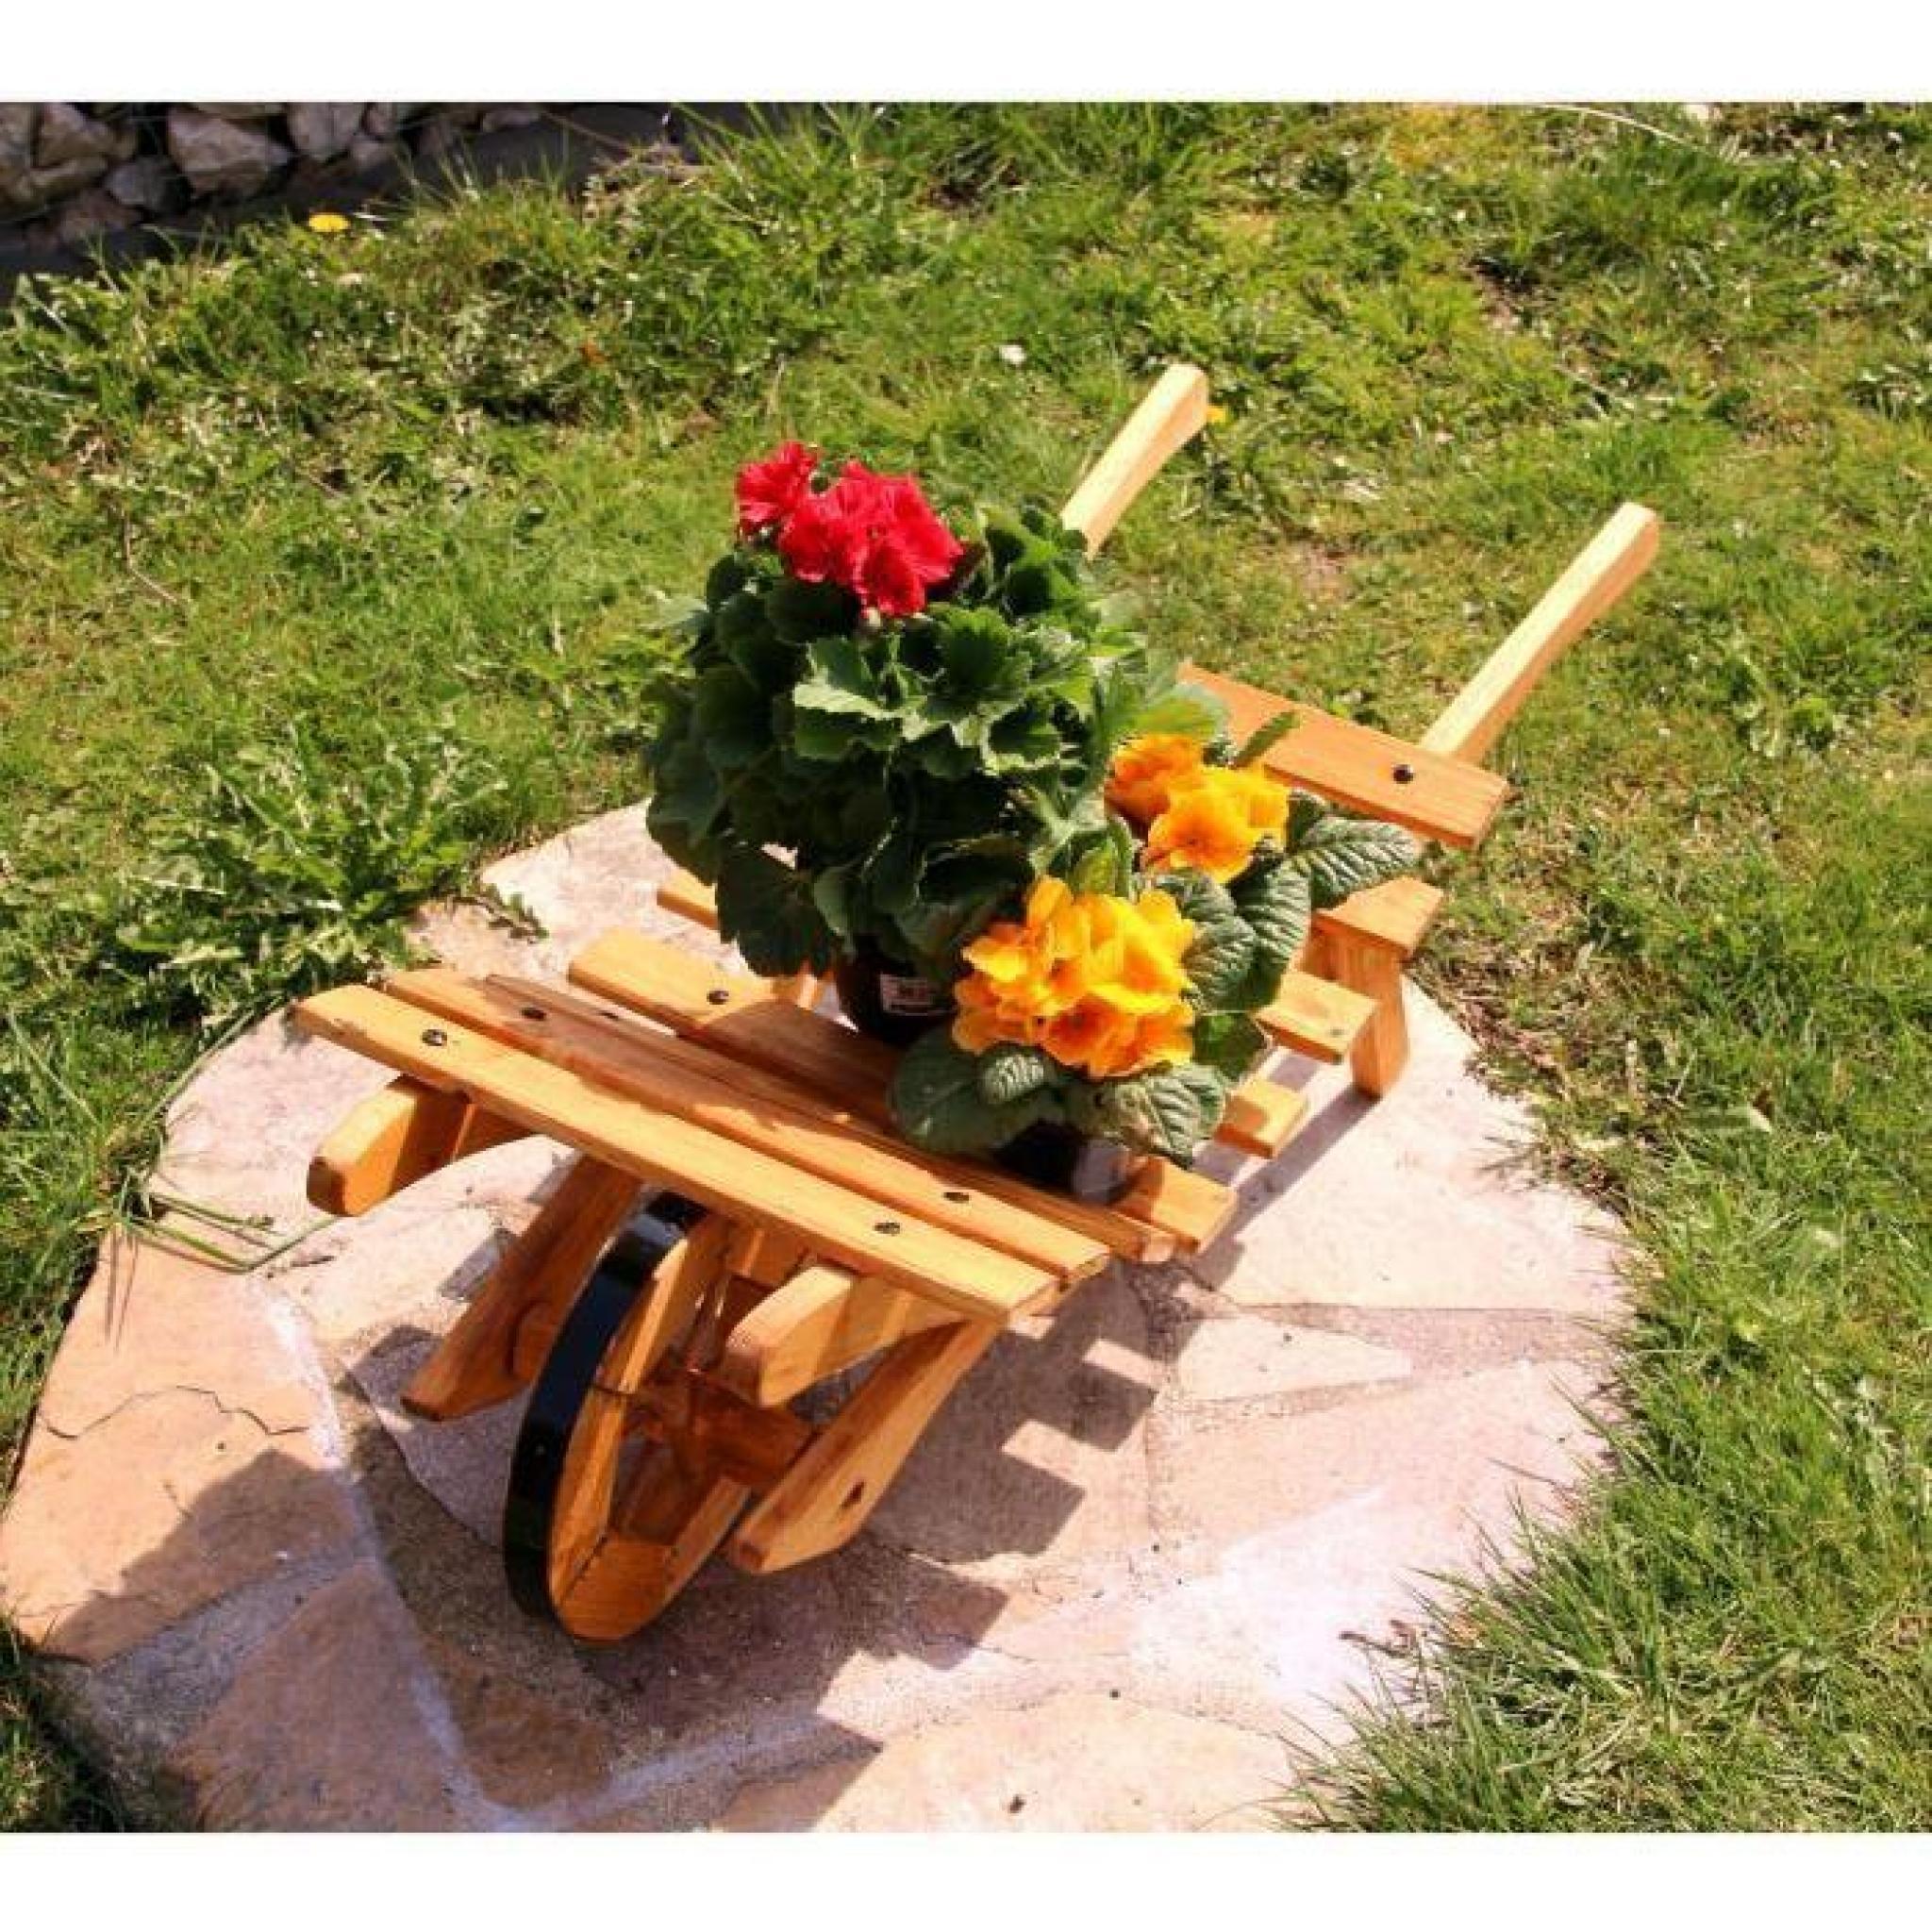 Brouette Fleurs Diable Brouette En Bois Typ 3 Petit concernant Brouette Deco Jardin